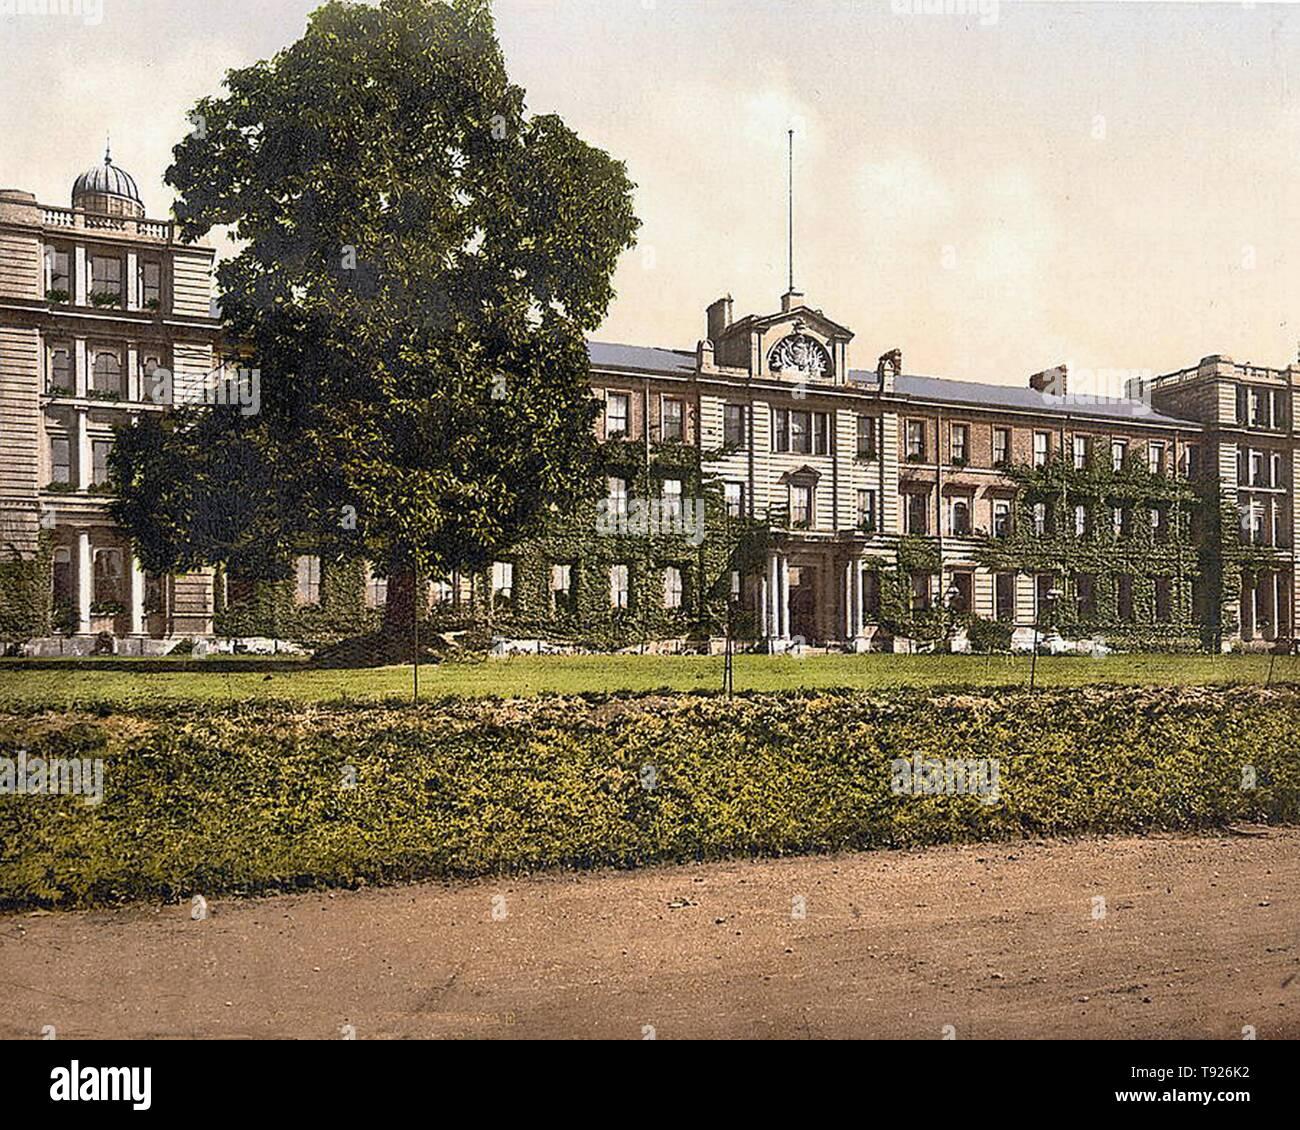 Royal Staff College, Camberley, Surrey, England. Stock Photo